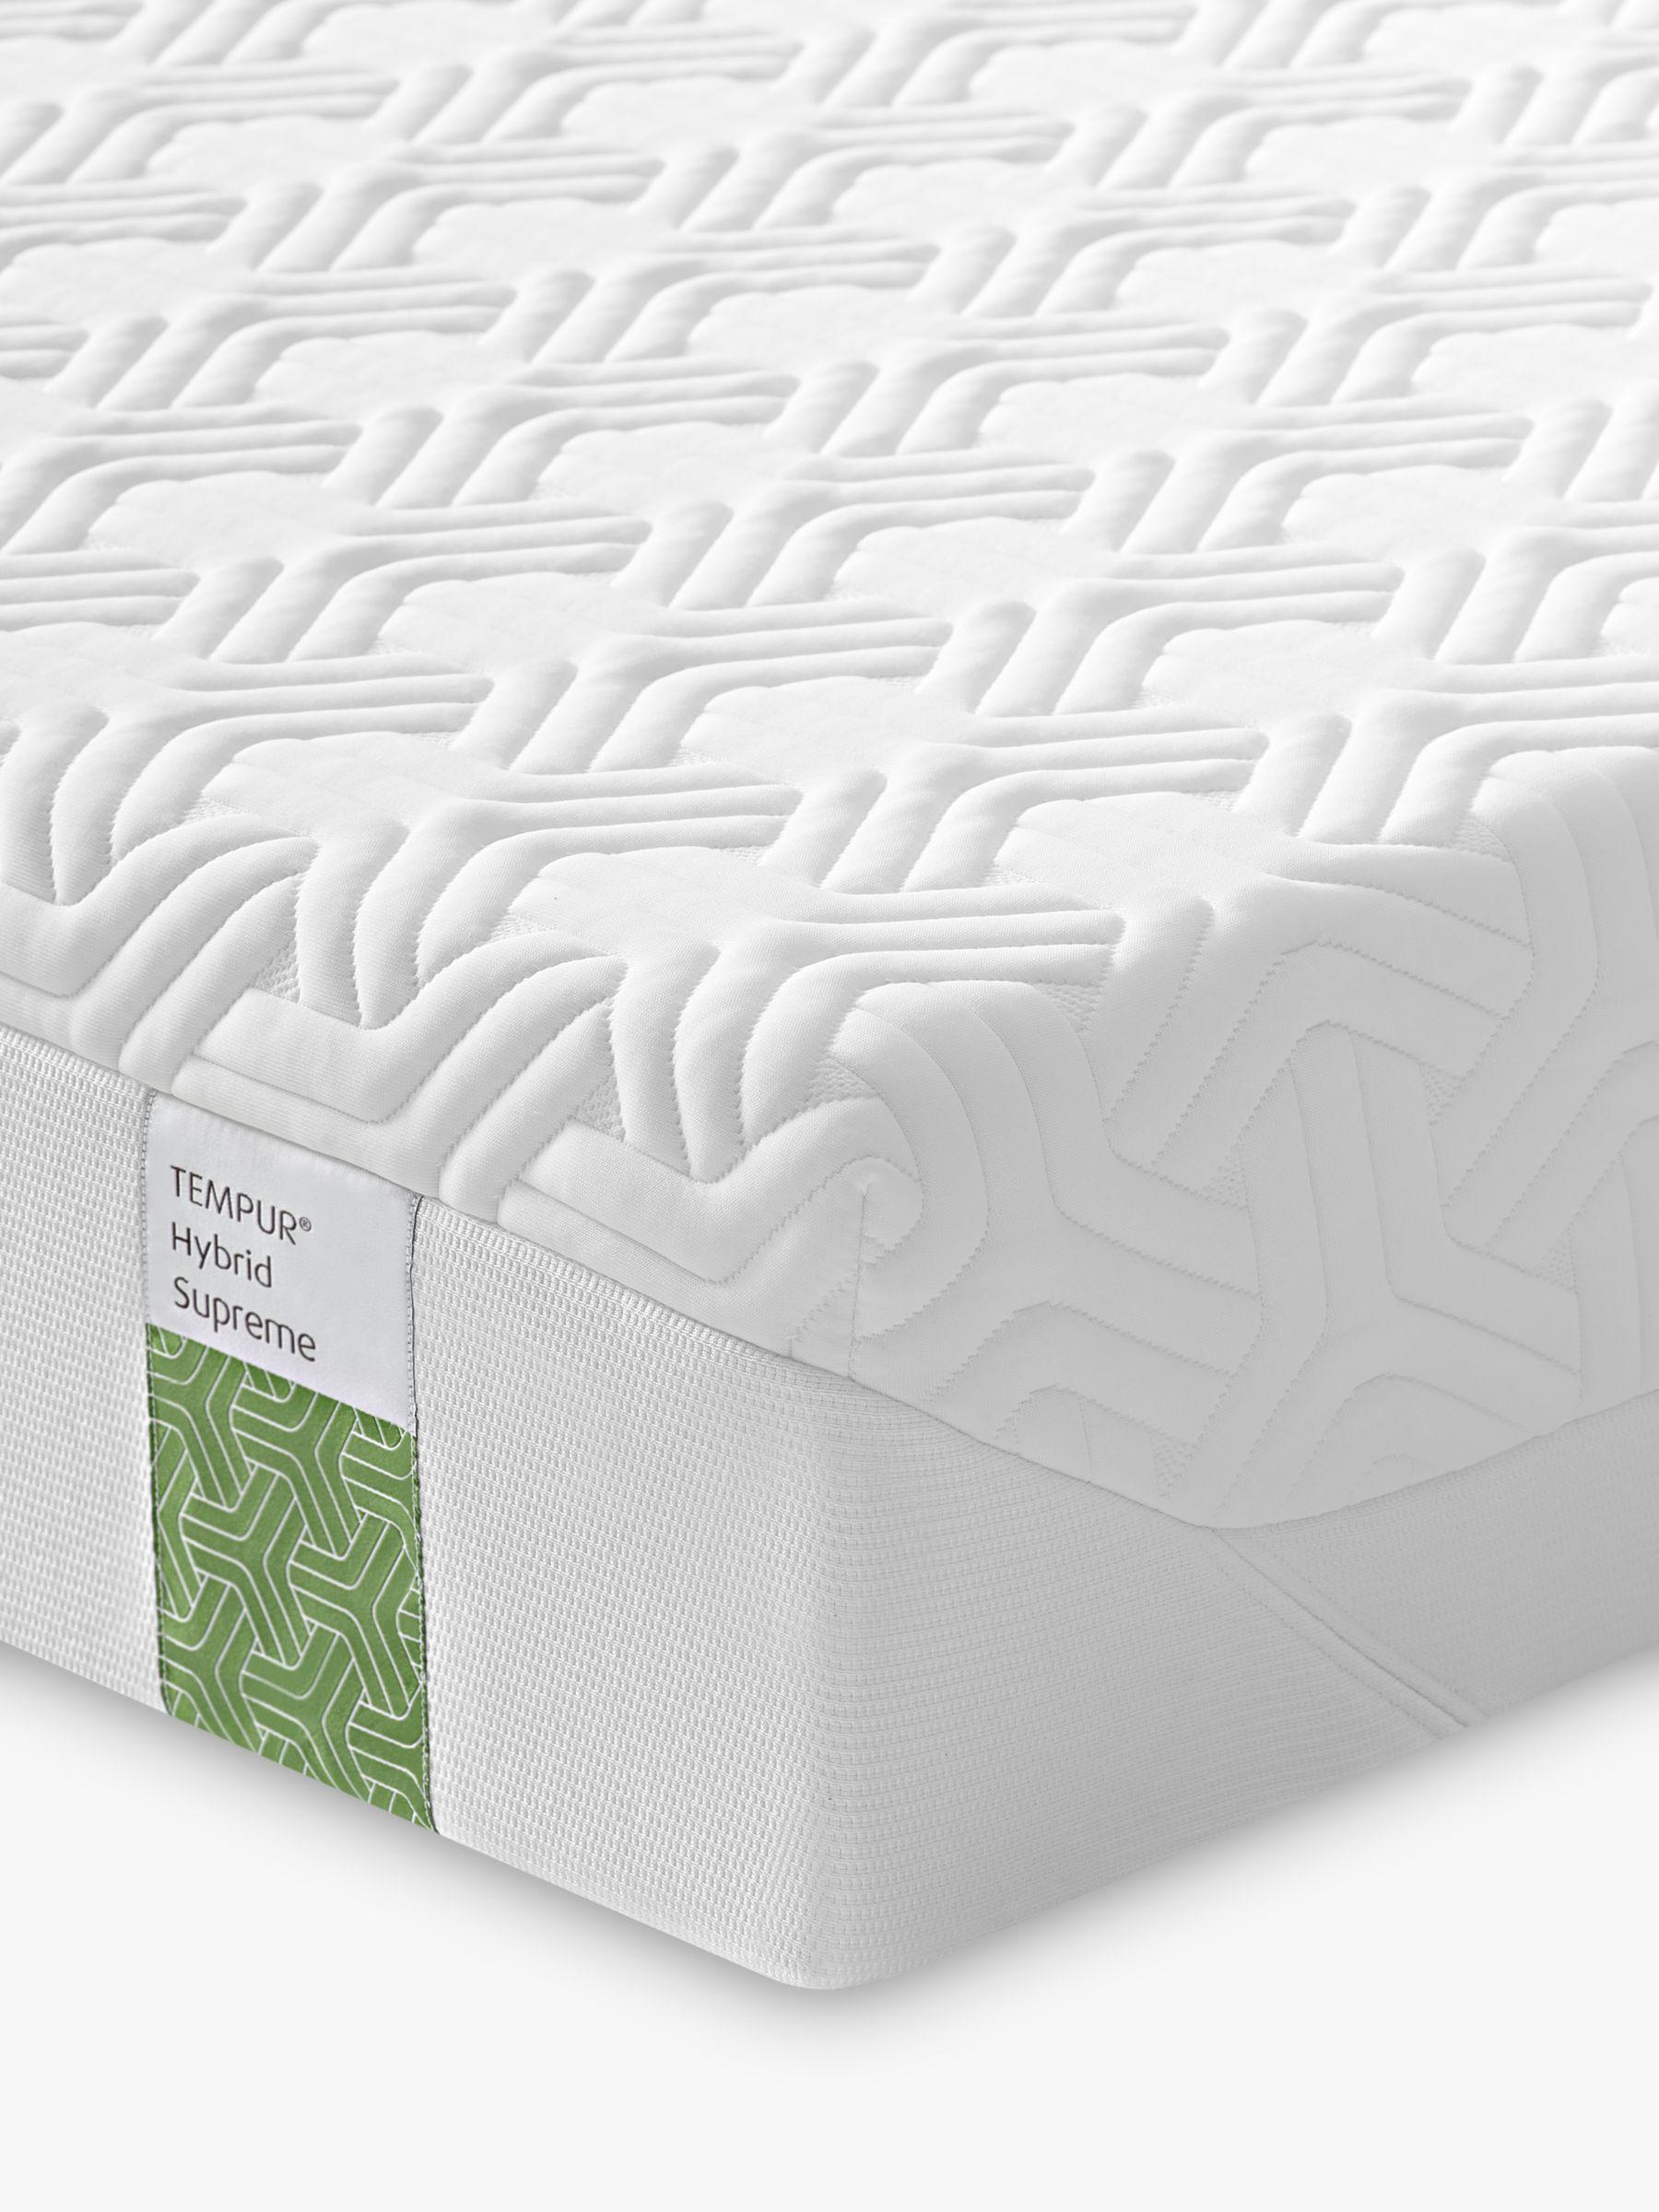 Tempur Tempur Hybrid Supreme Pocket Spring Memory Foam Mattress, Super King Size